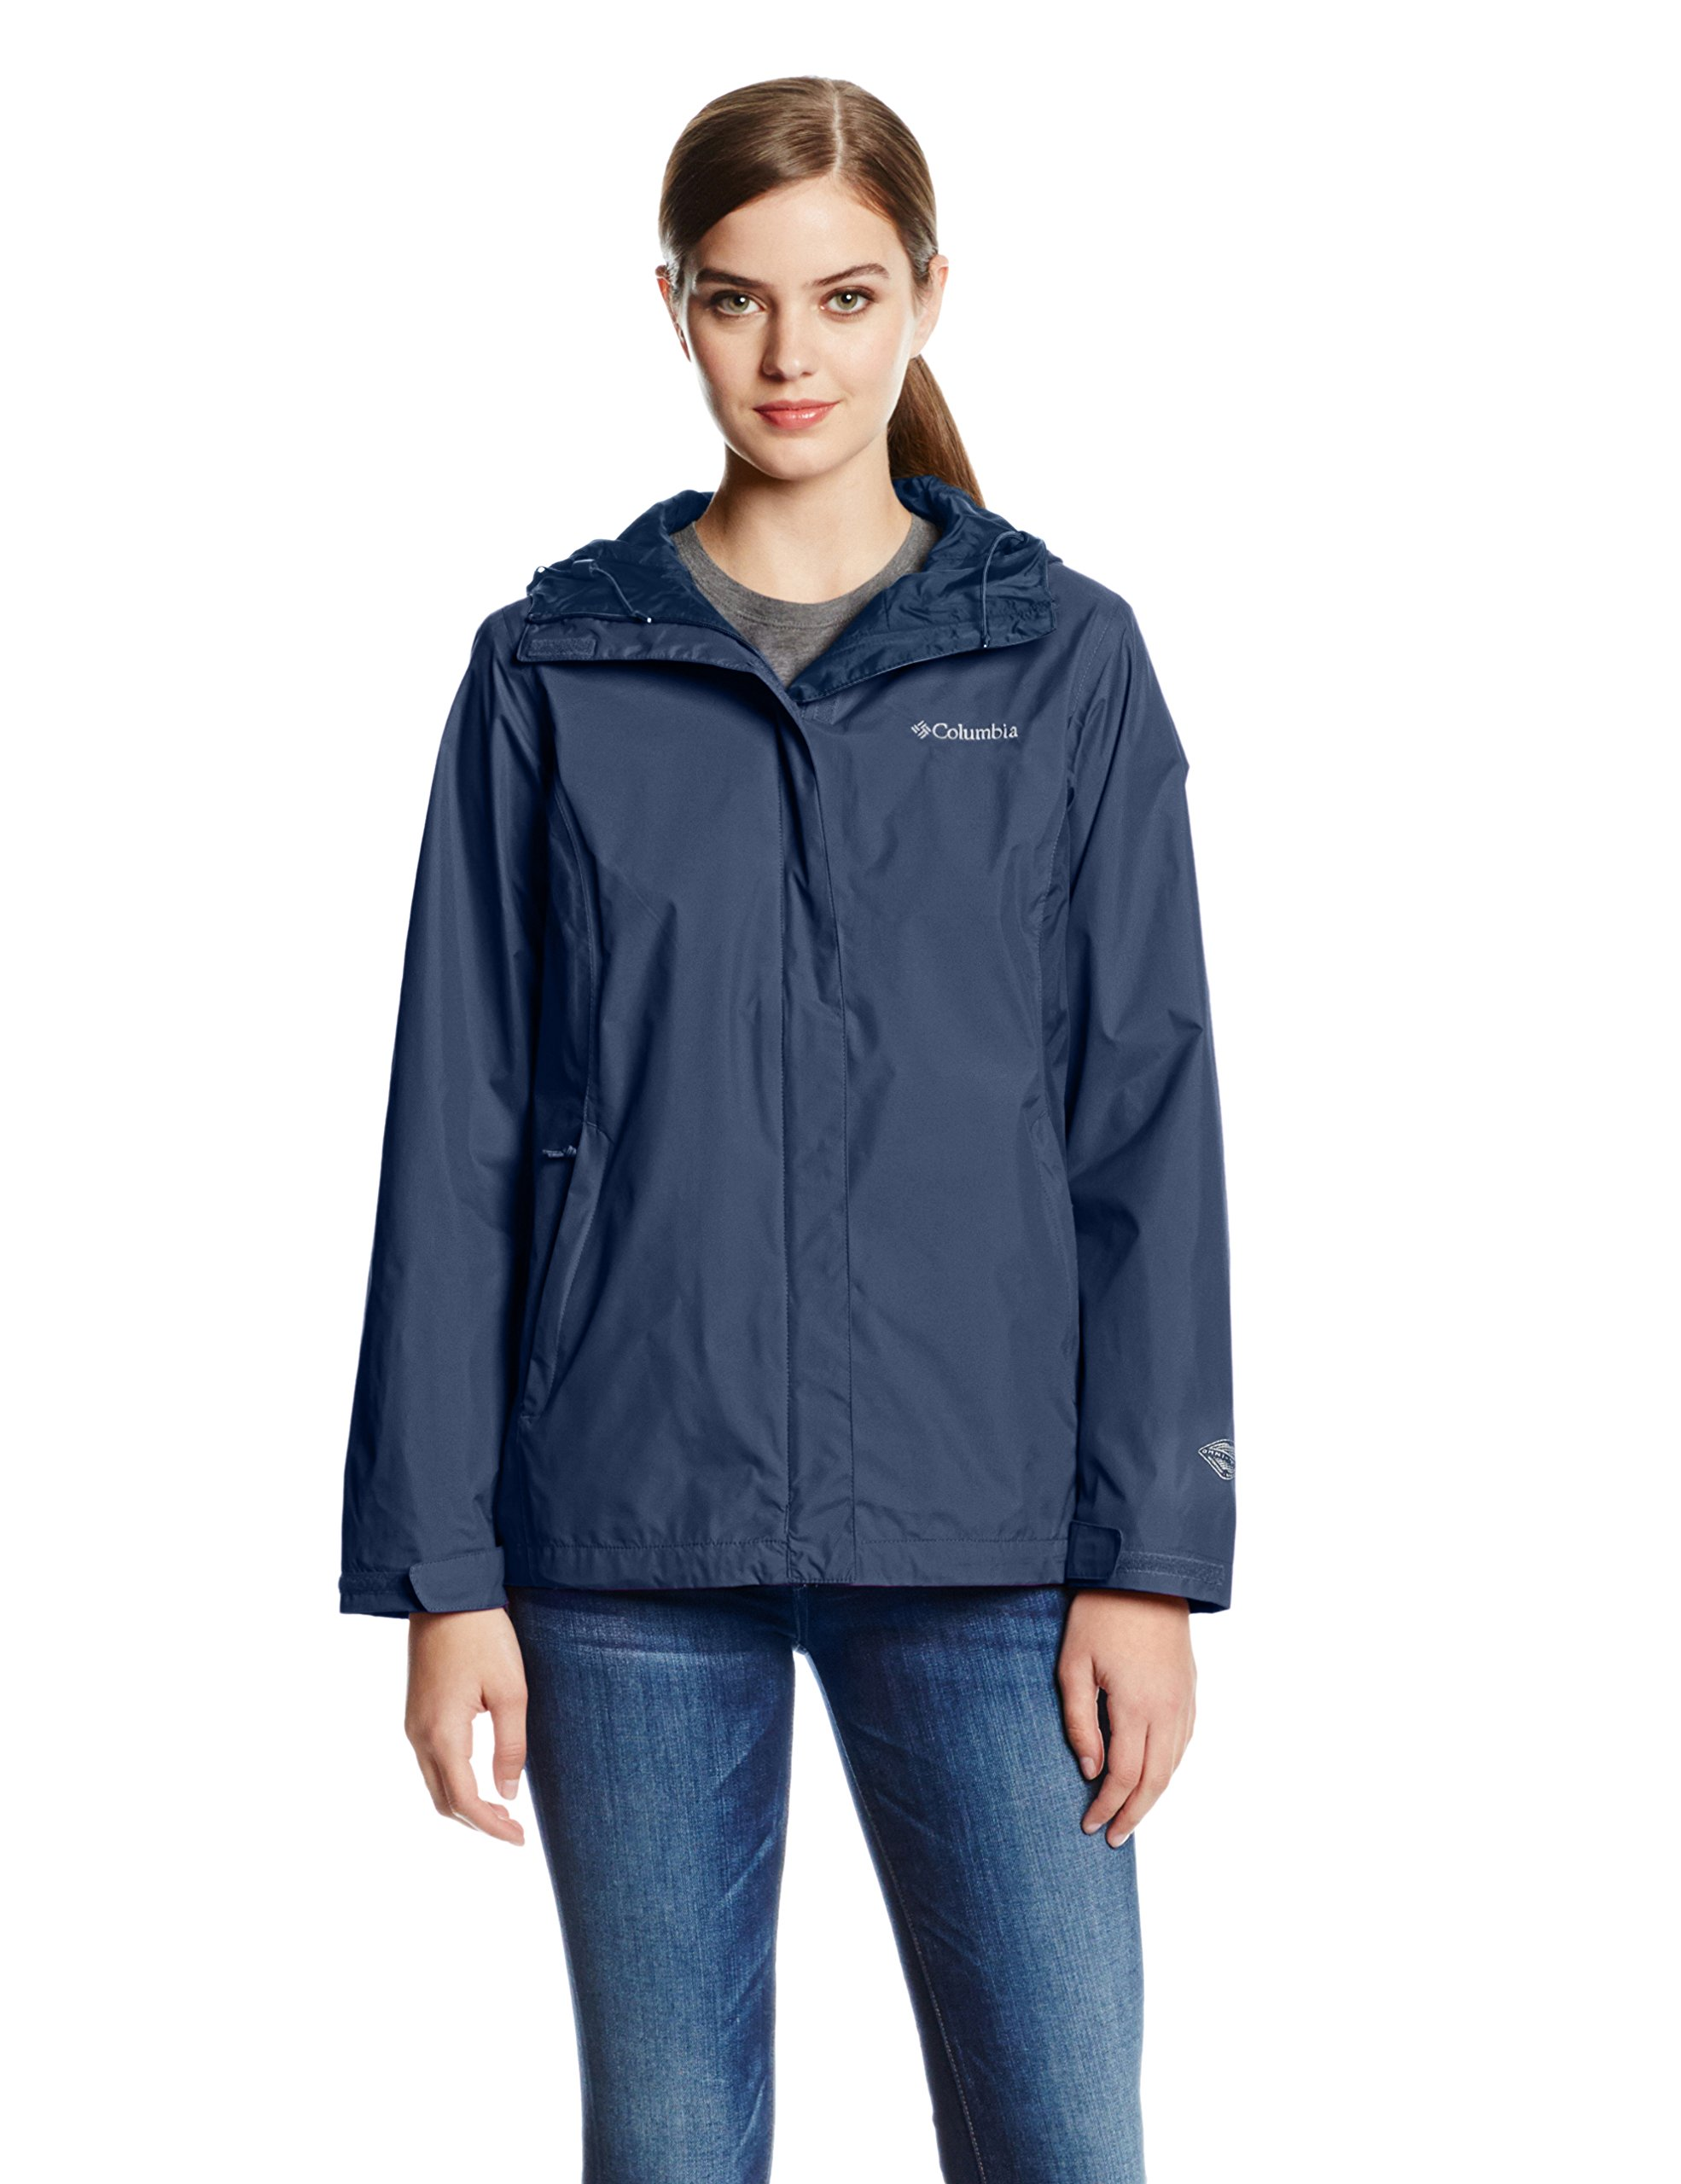 Columbia Women's Arcadia II Waterproof Breathable Jacket with Packable Hood, Navy, Small by Columbia